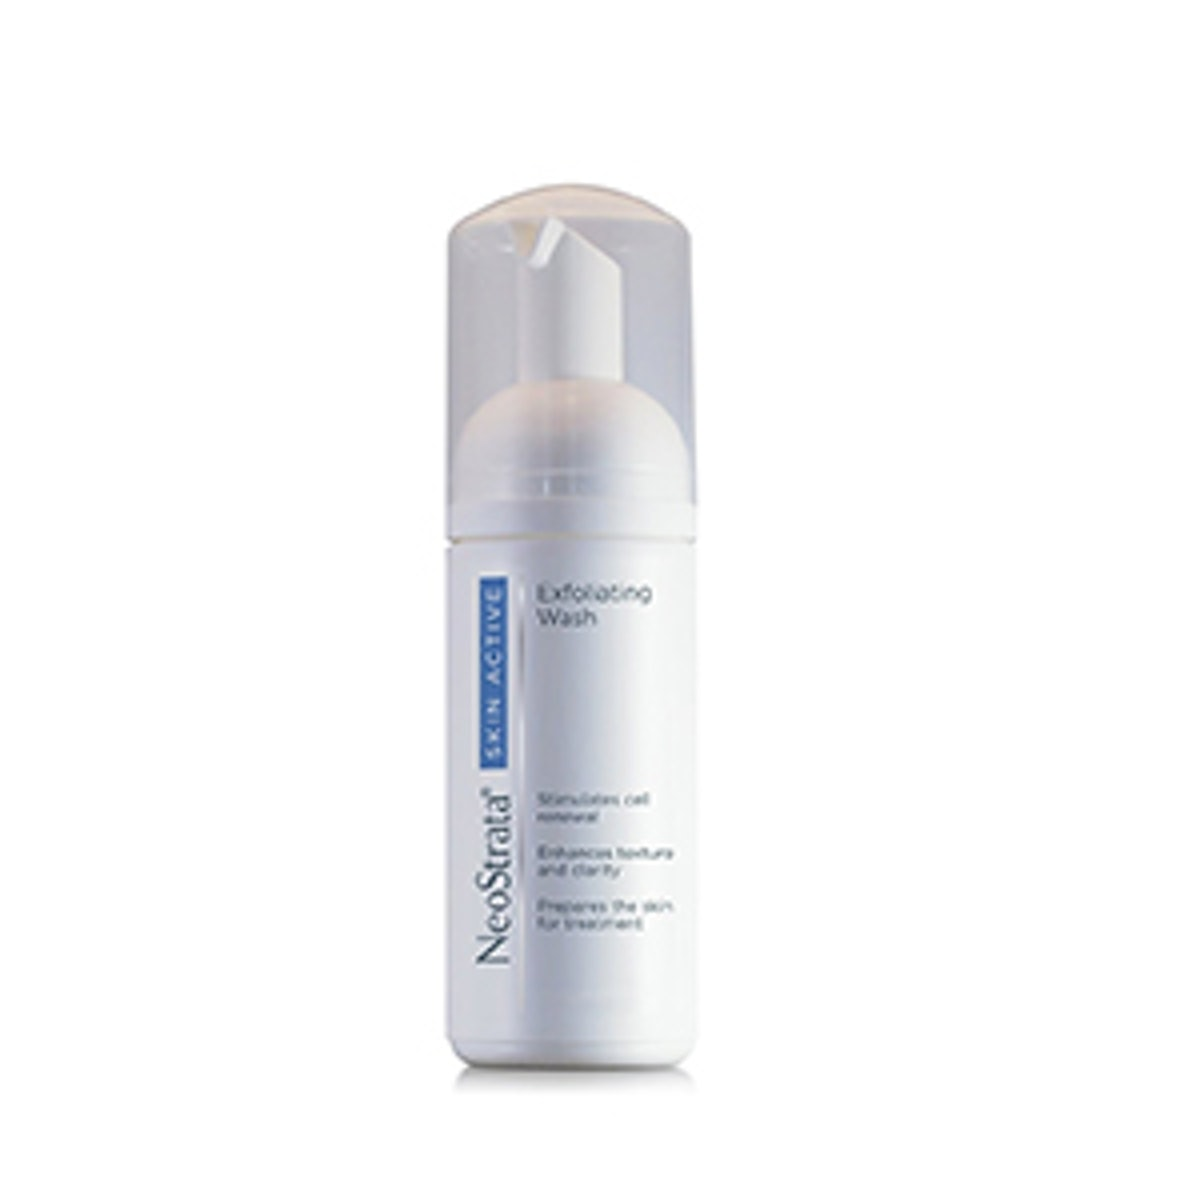 NeoStrata Exfoliating Face Wash